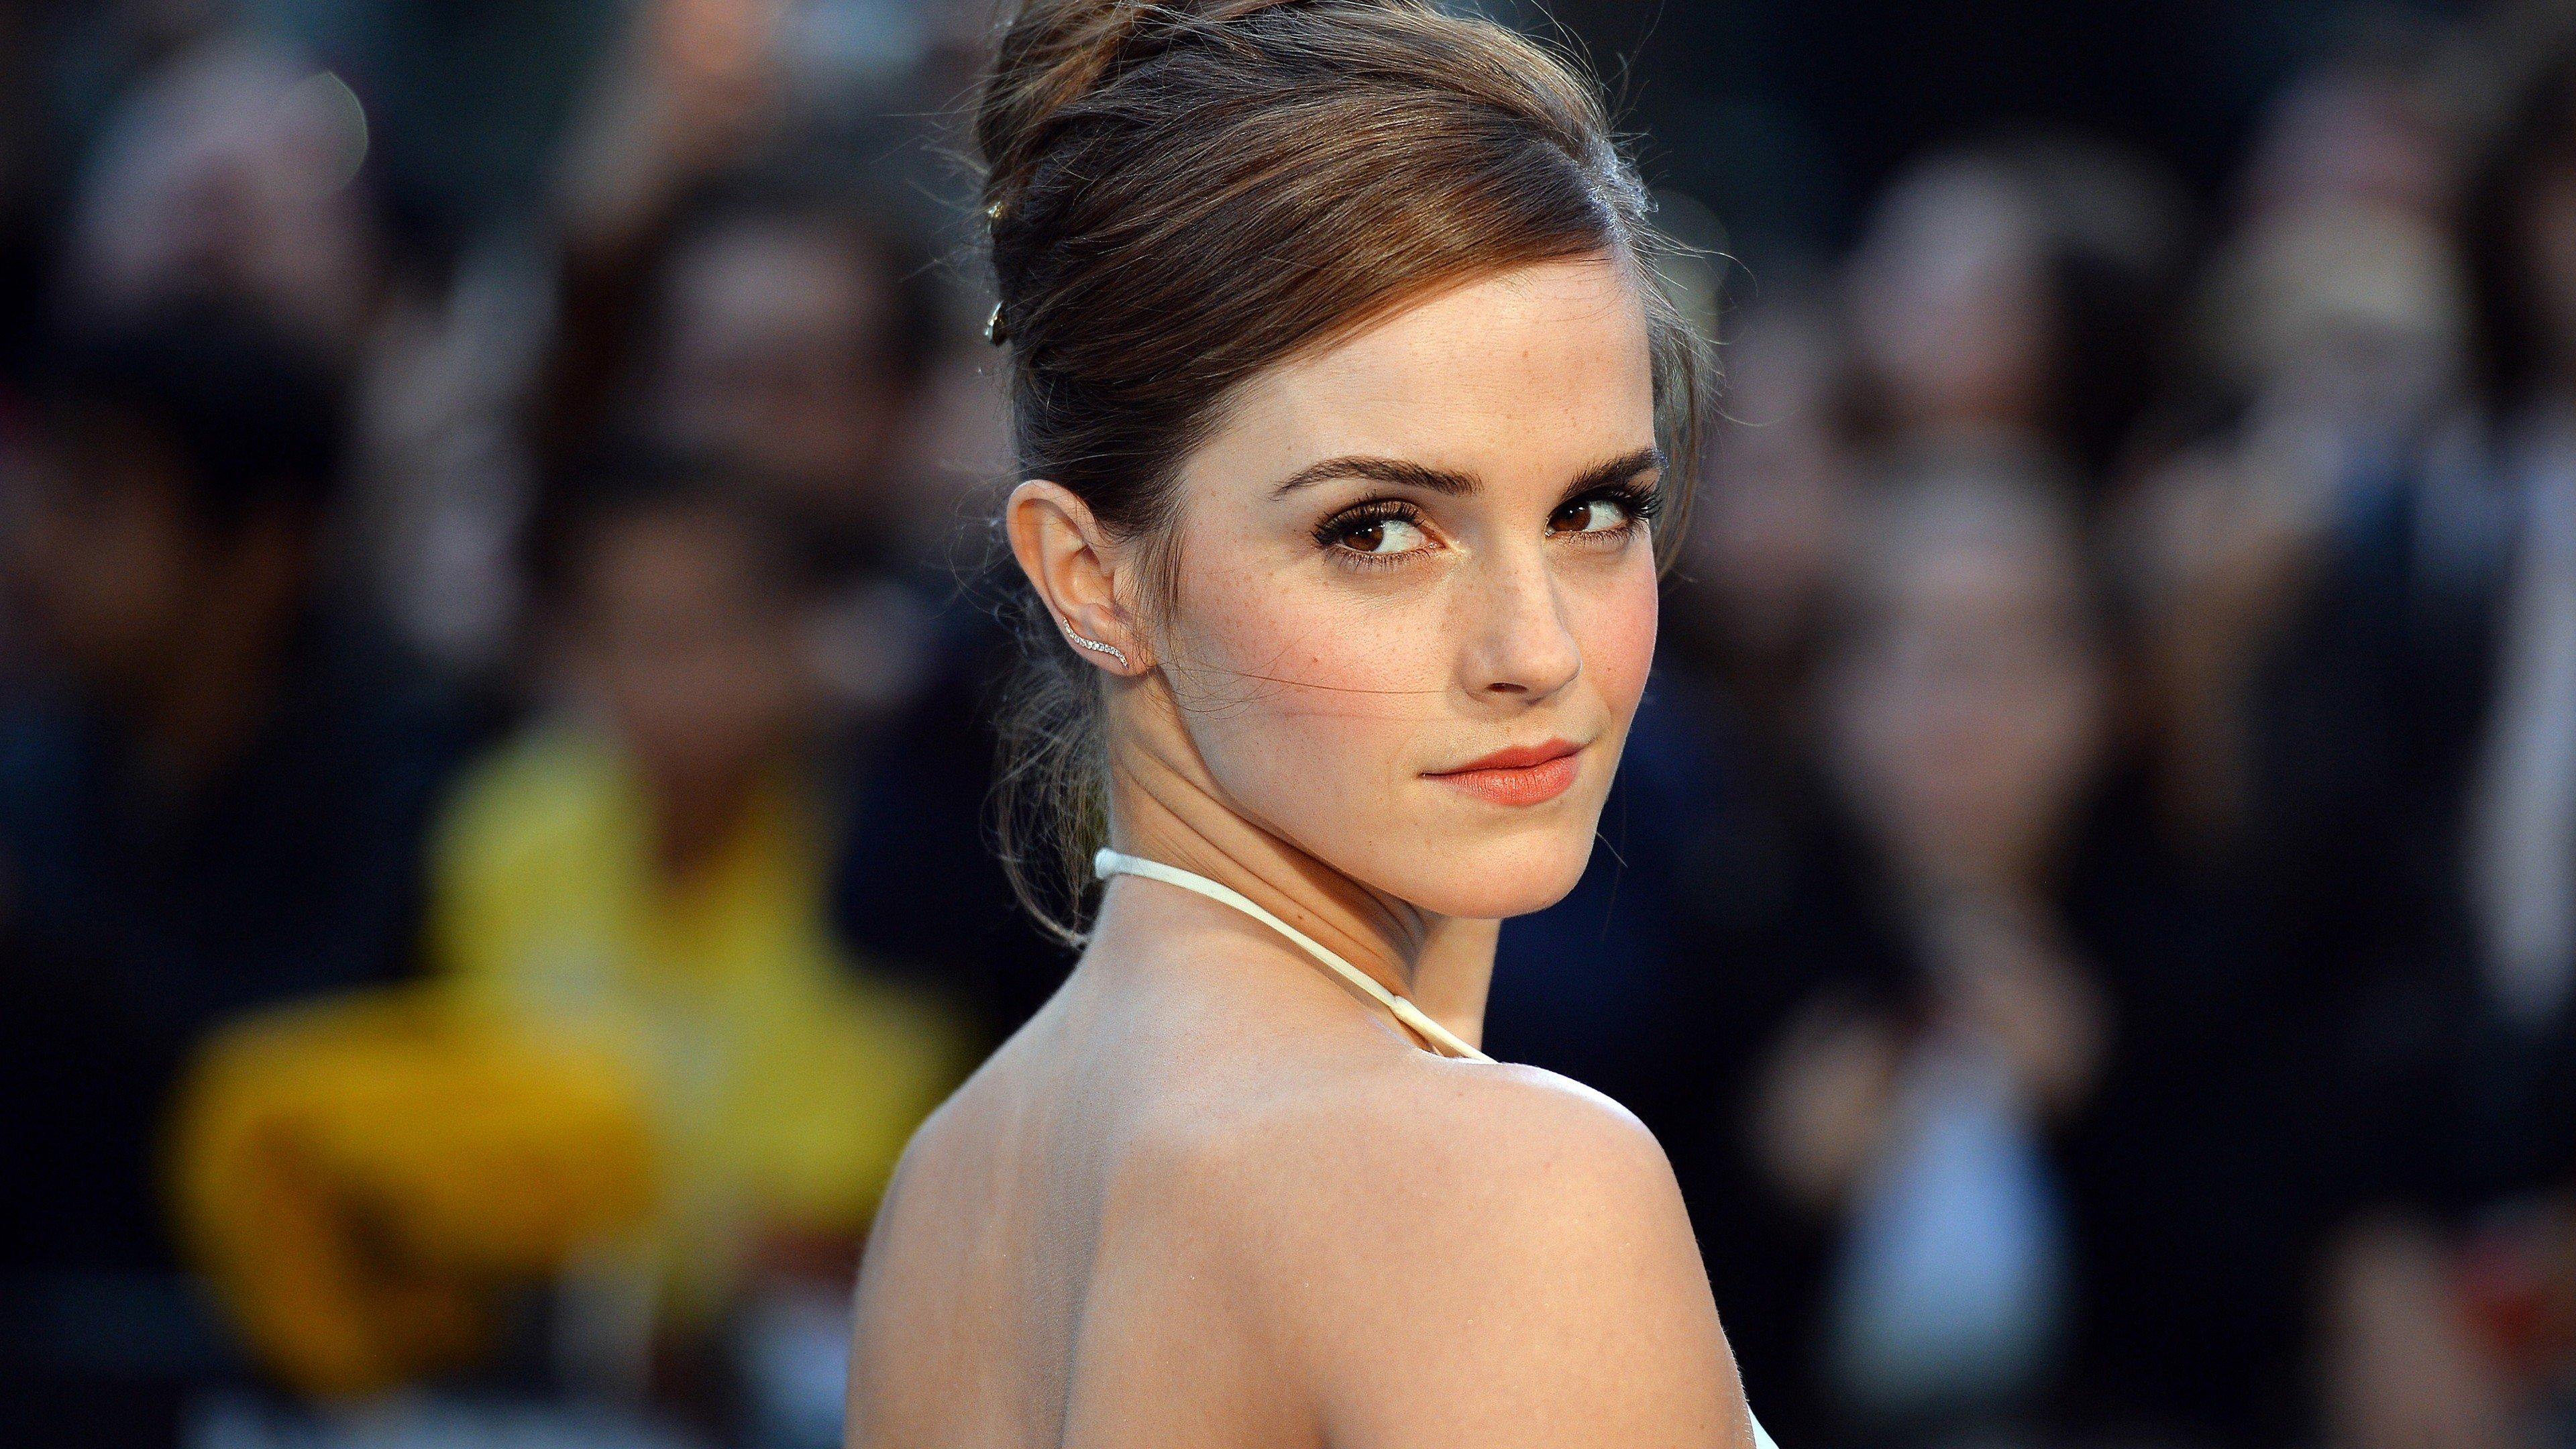 Emma Watson, Actress, Brunette, Photography, Closeup